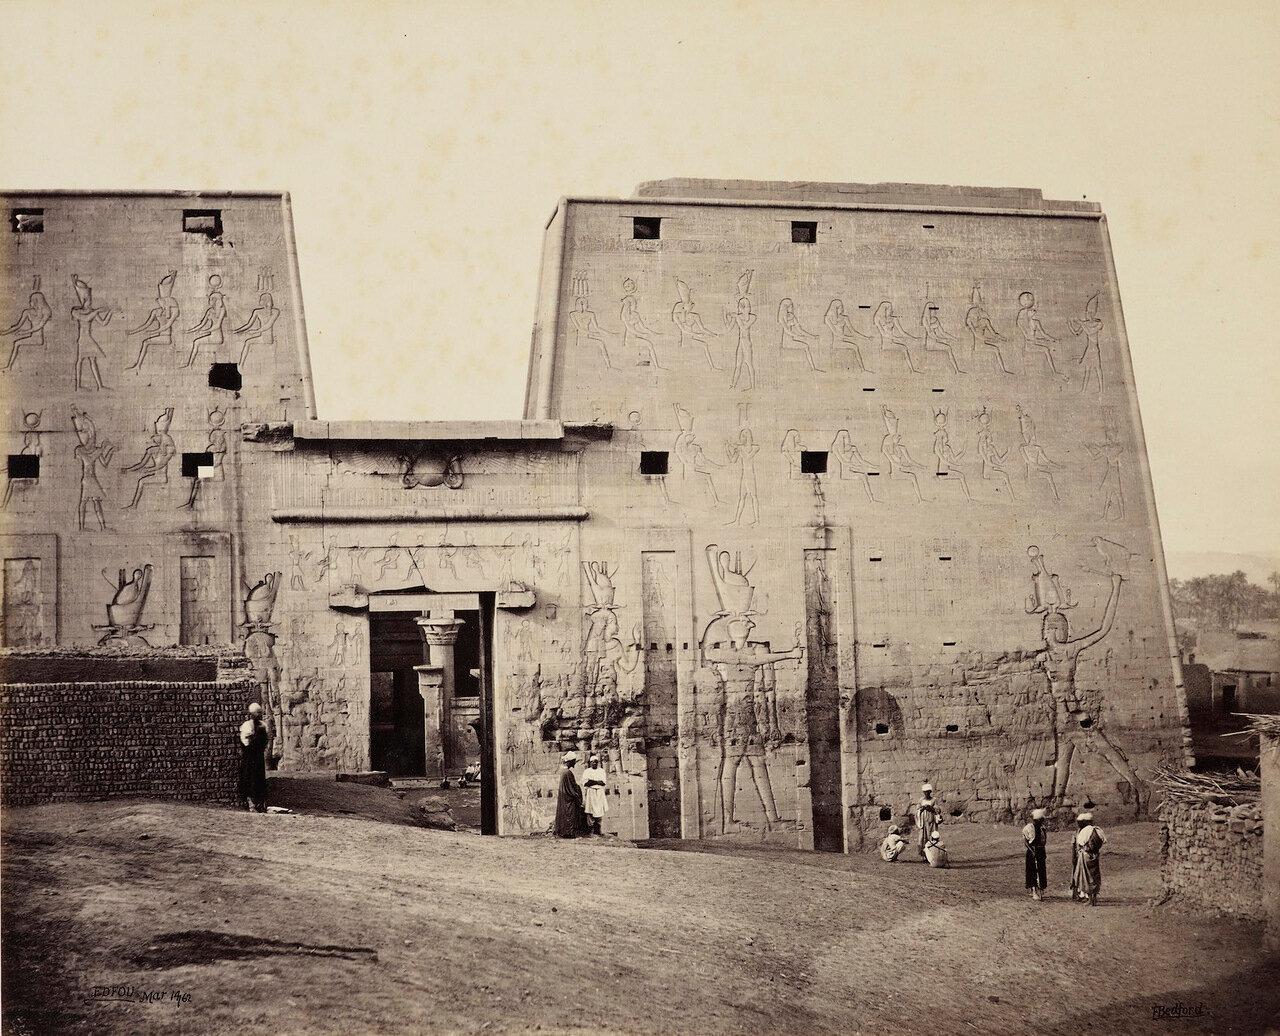 14 марта 1862. Большая арка храма Гора, Эдфу